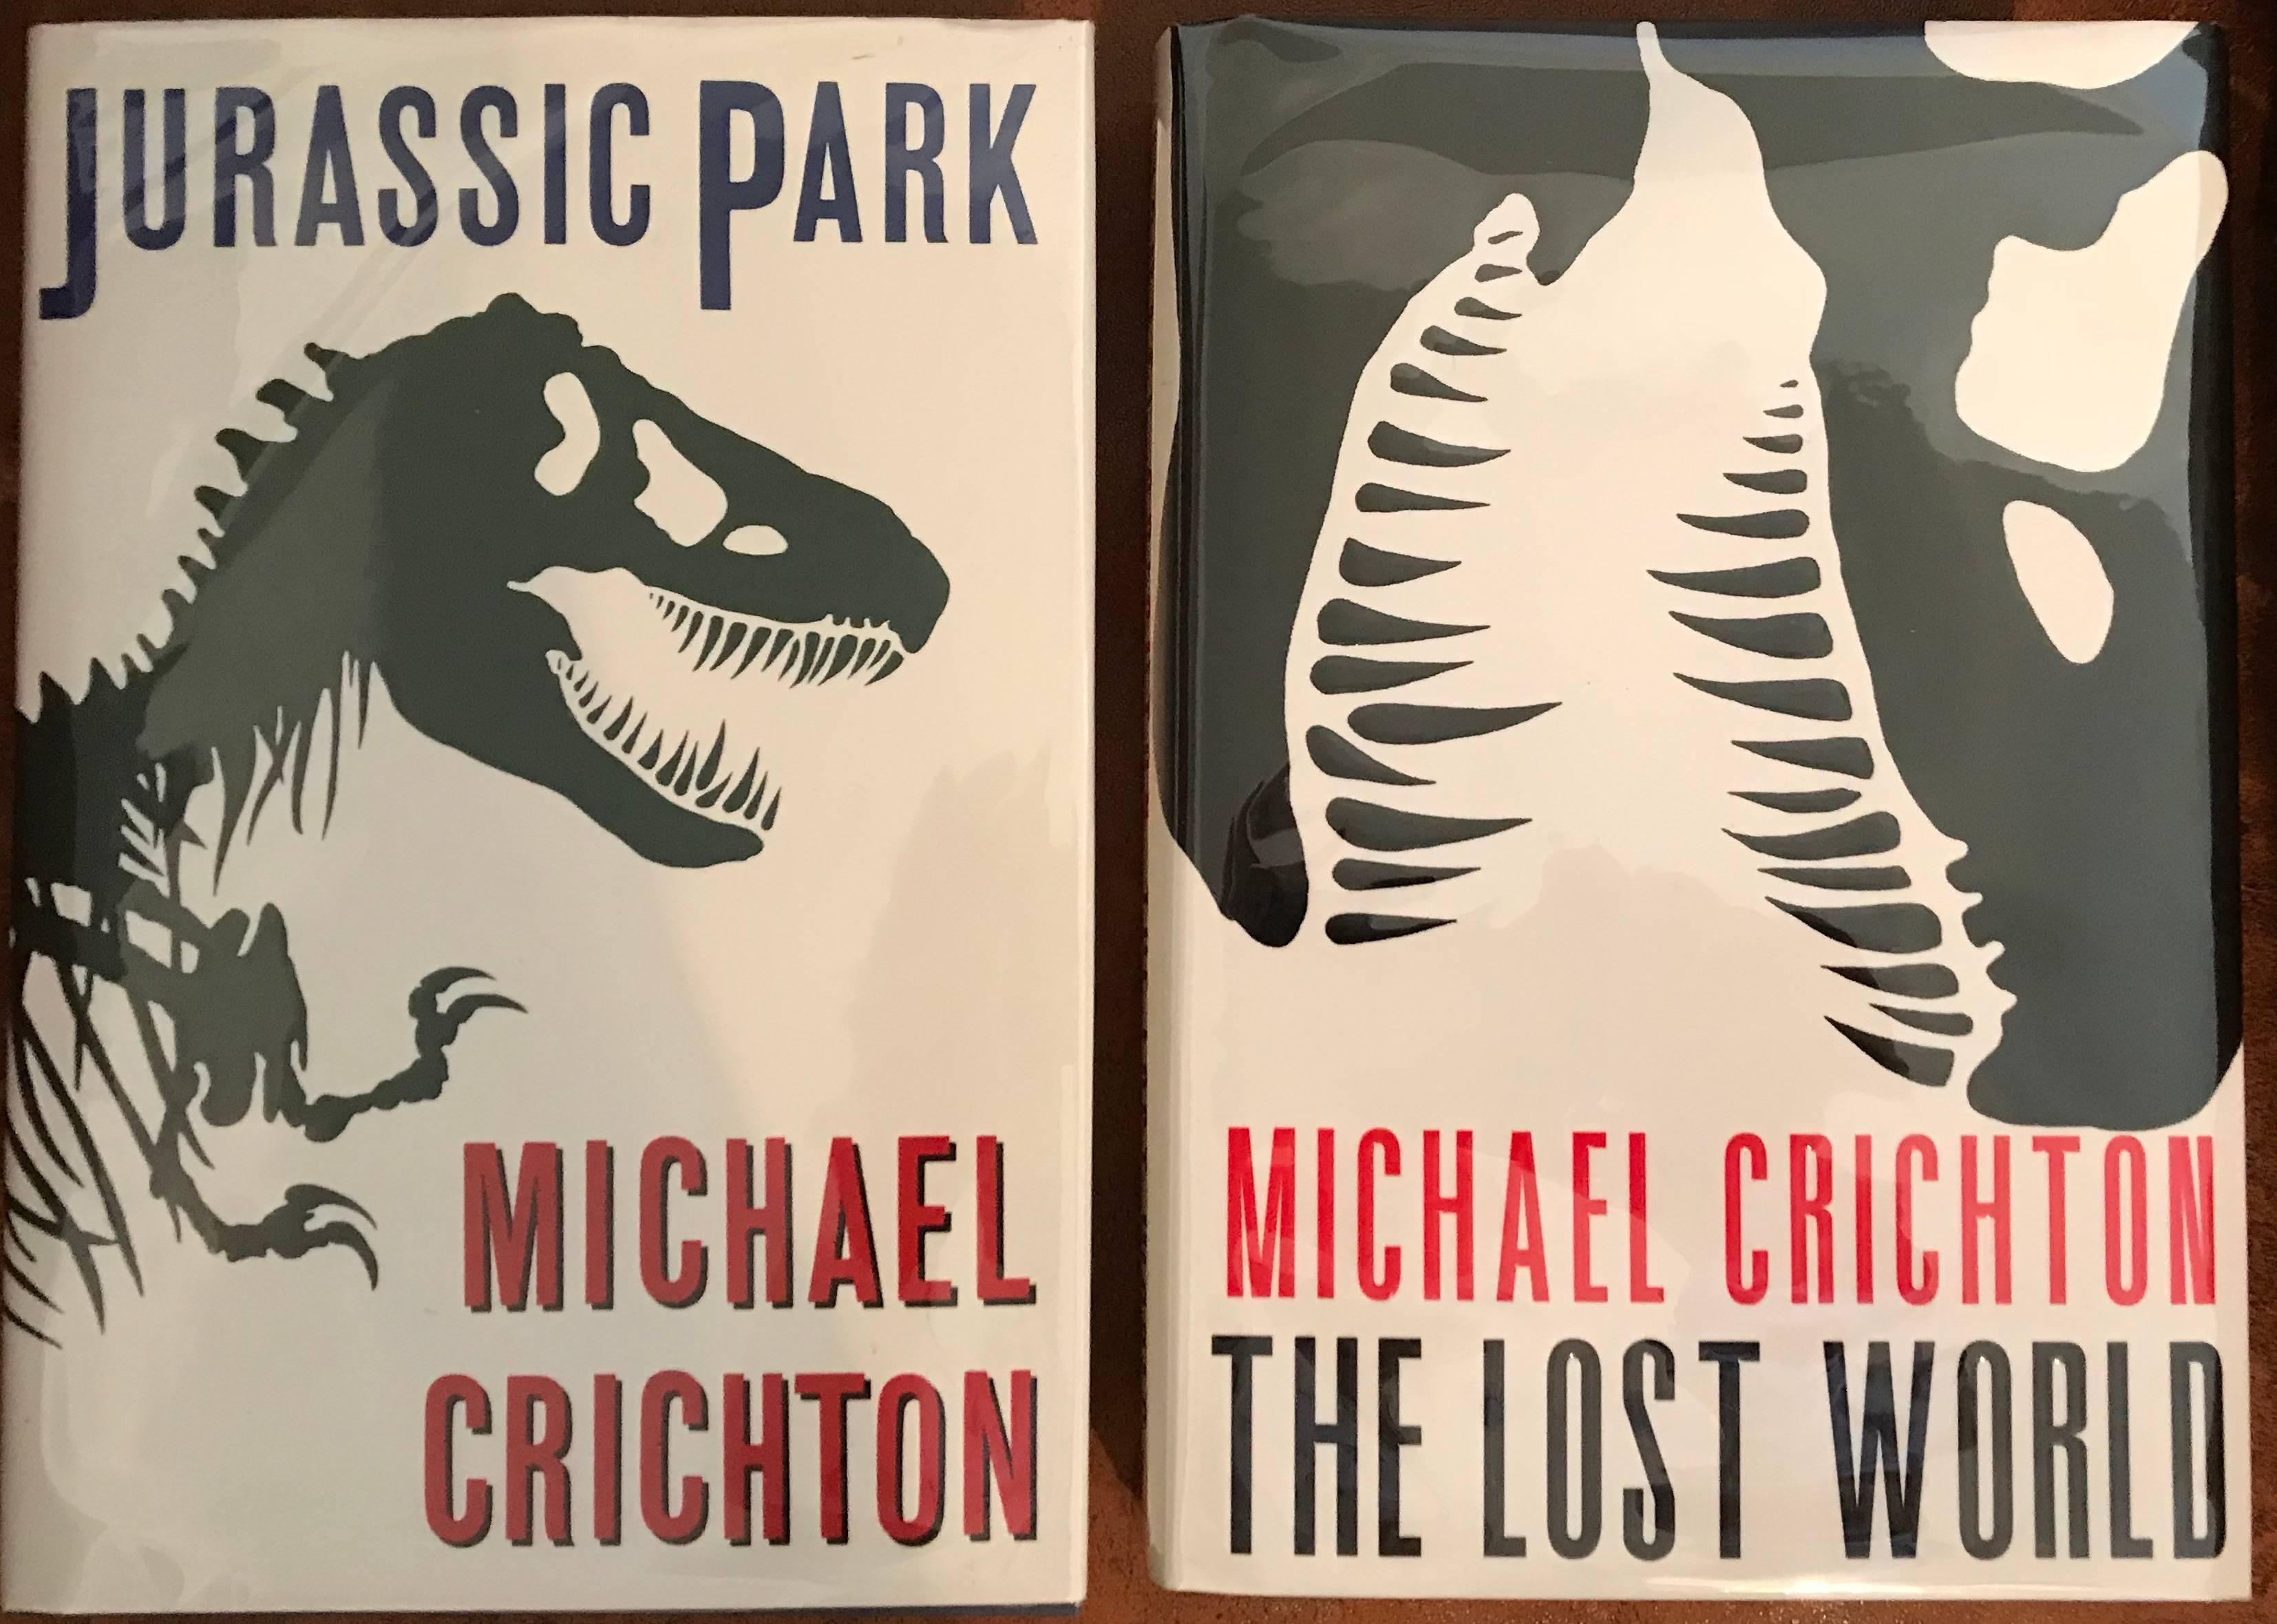 Michael Crichton ranked